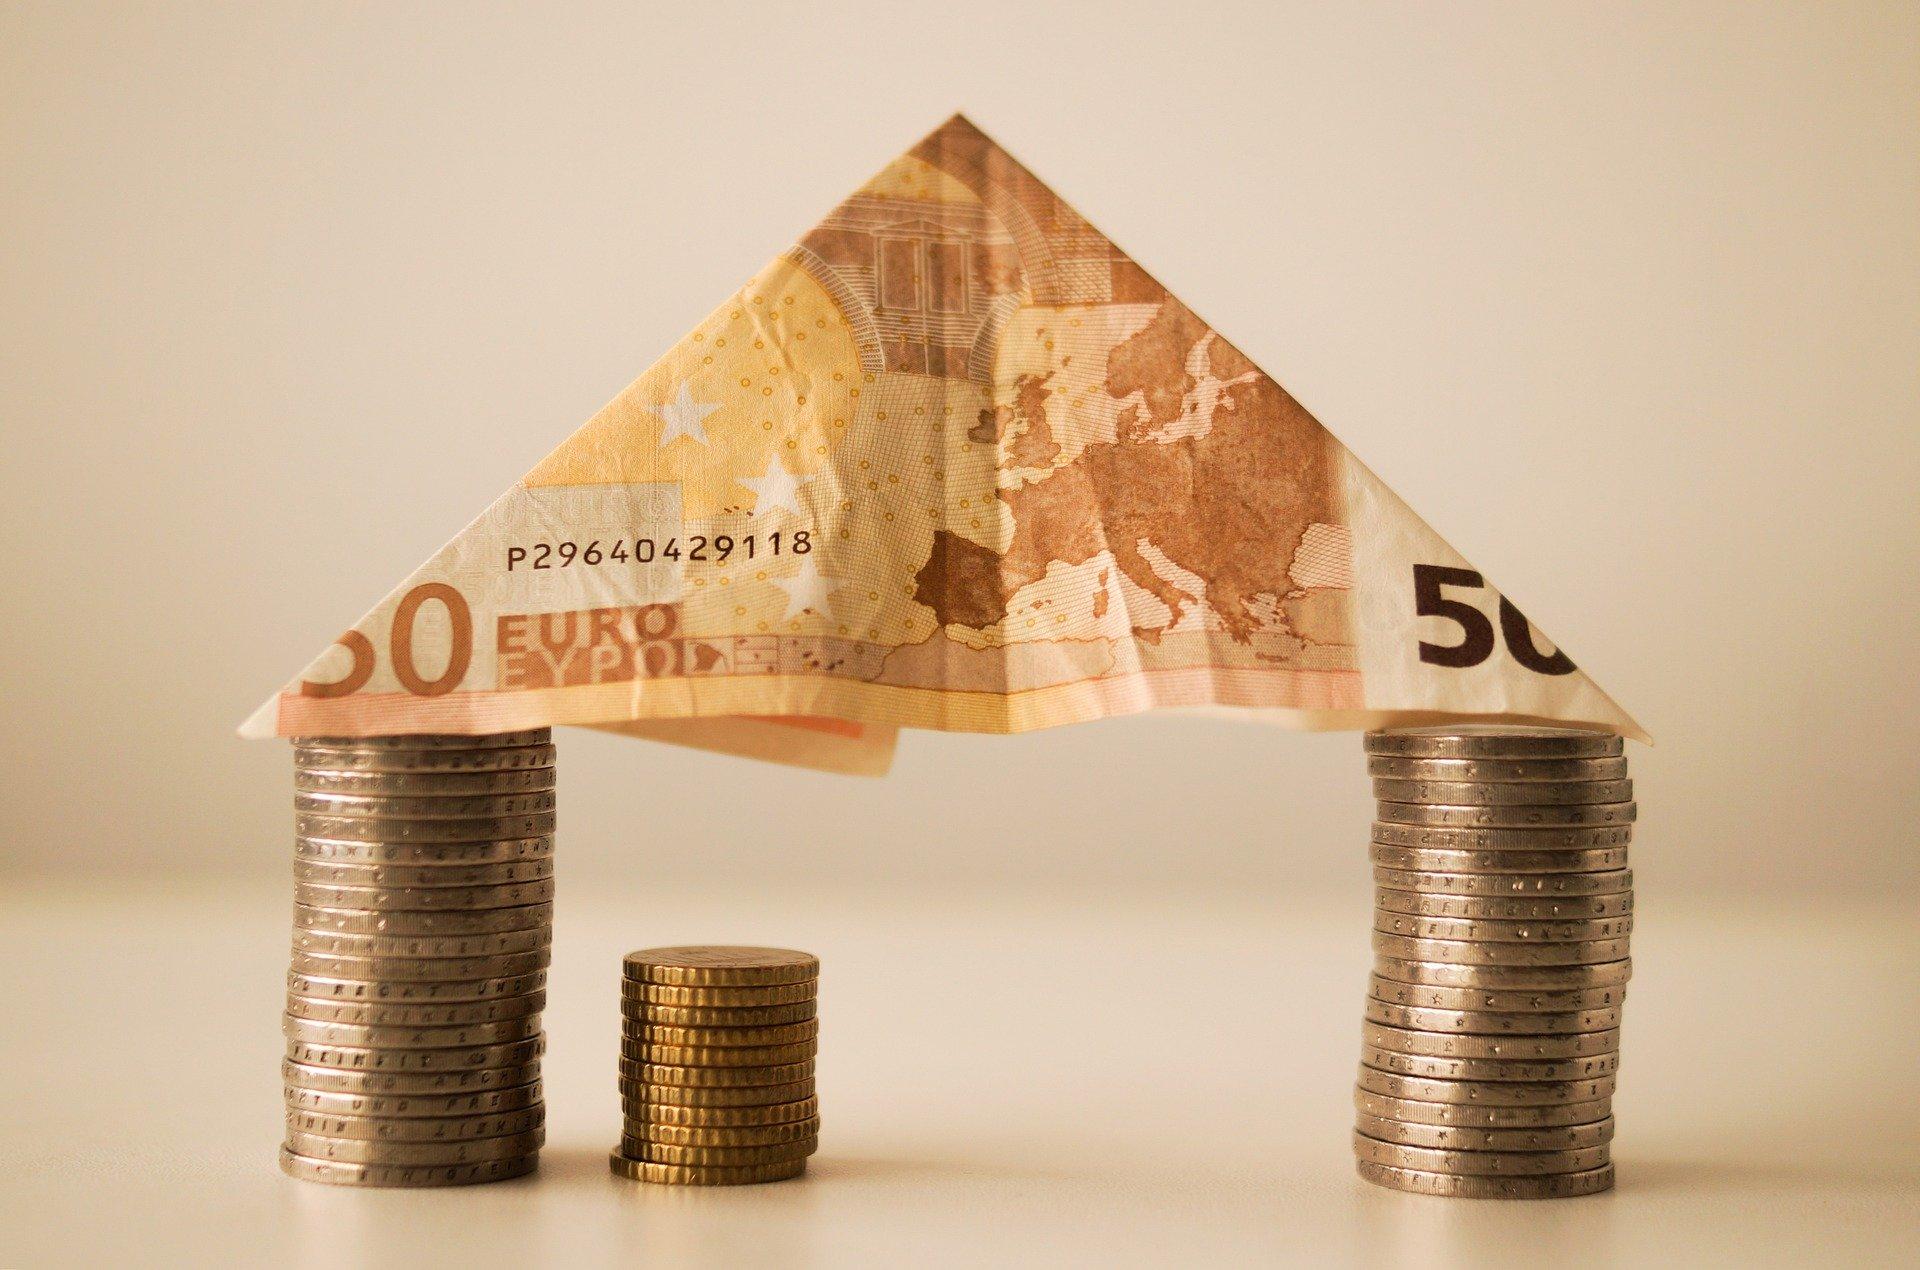 hipoteca cambio banco